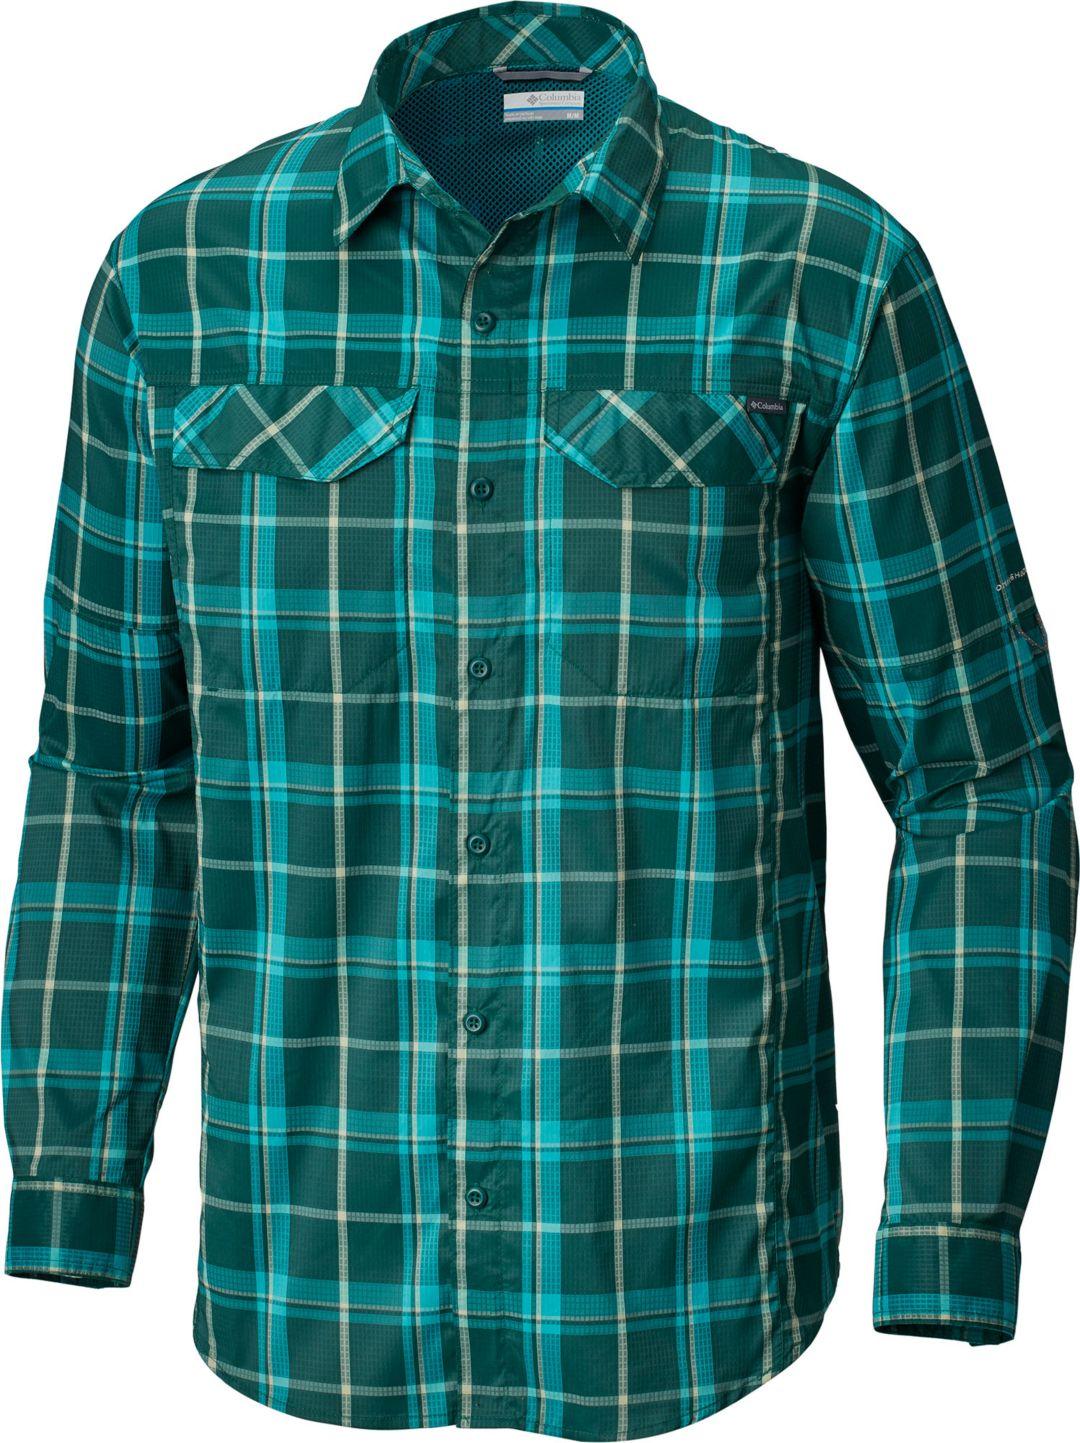 16e0bdf5adf Columbia Men's Silver Ridge Lite Plaid Long Sleeve Shirt | DICK'S ...